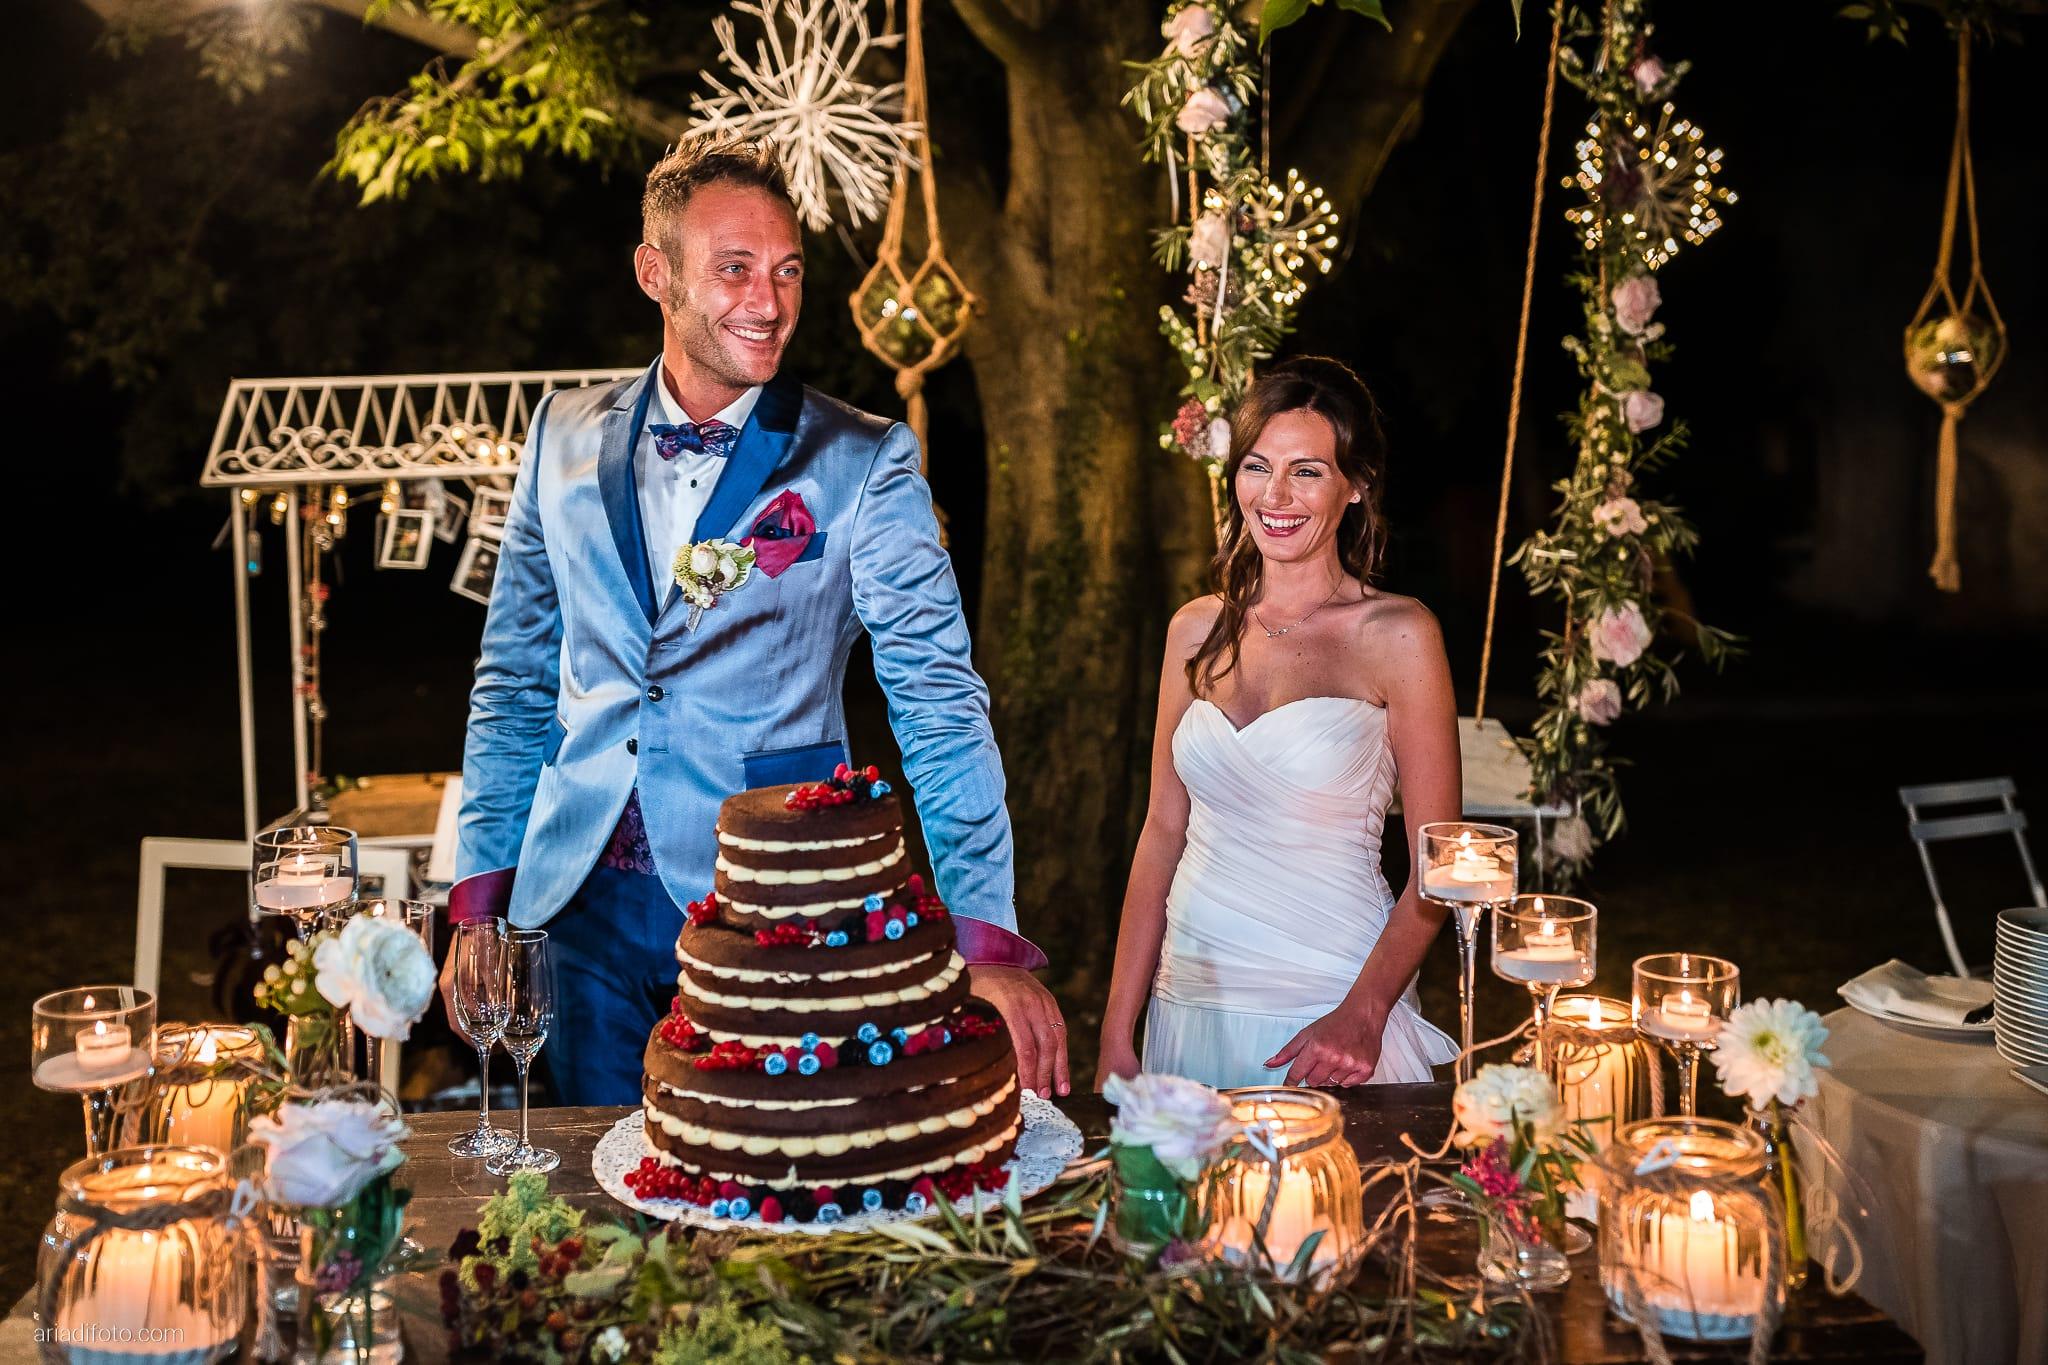 Stefania Raffaele Matrimonio Country Chic Outdoor Gorizia ricevimento taglio della torta naked cake